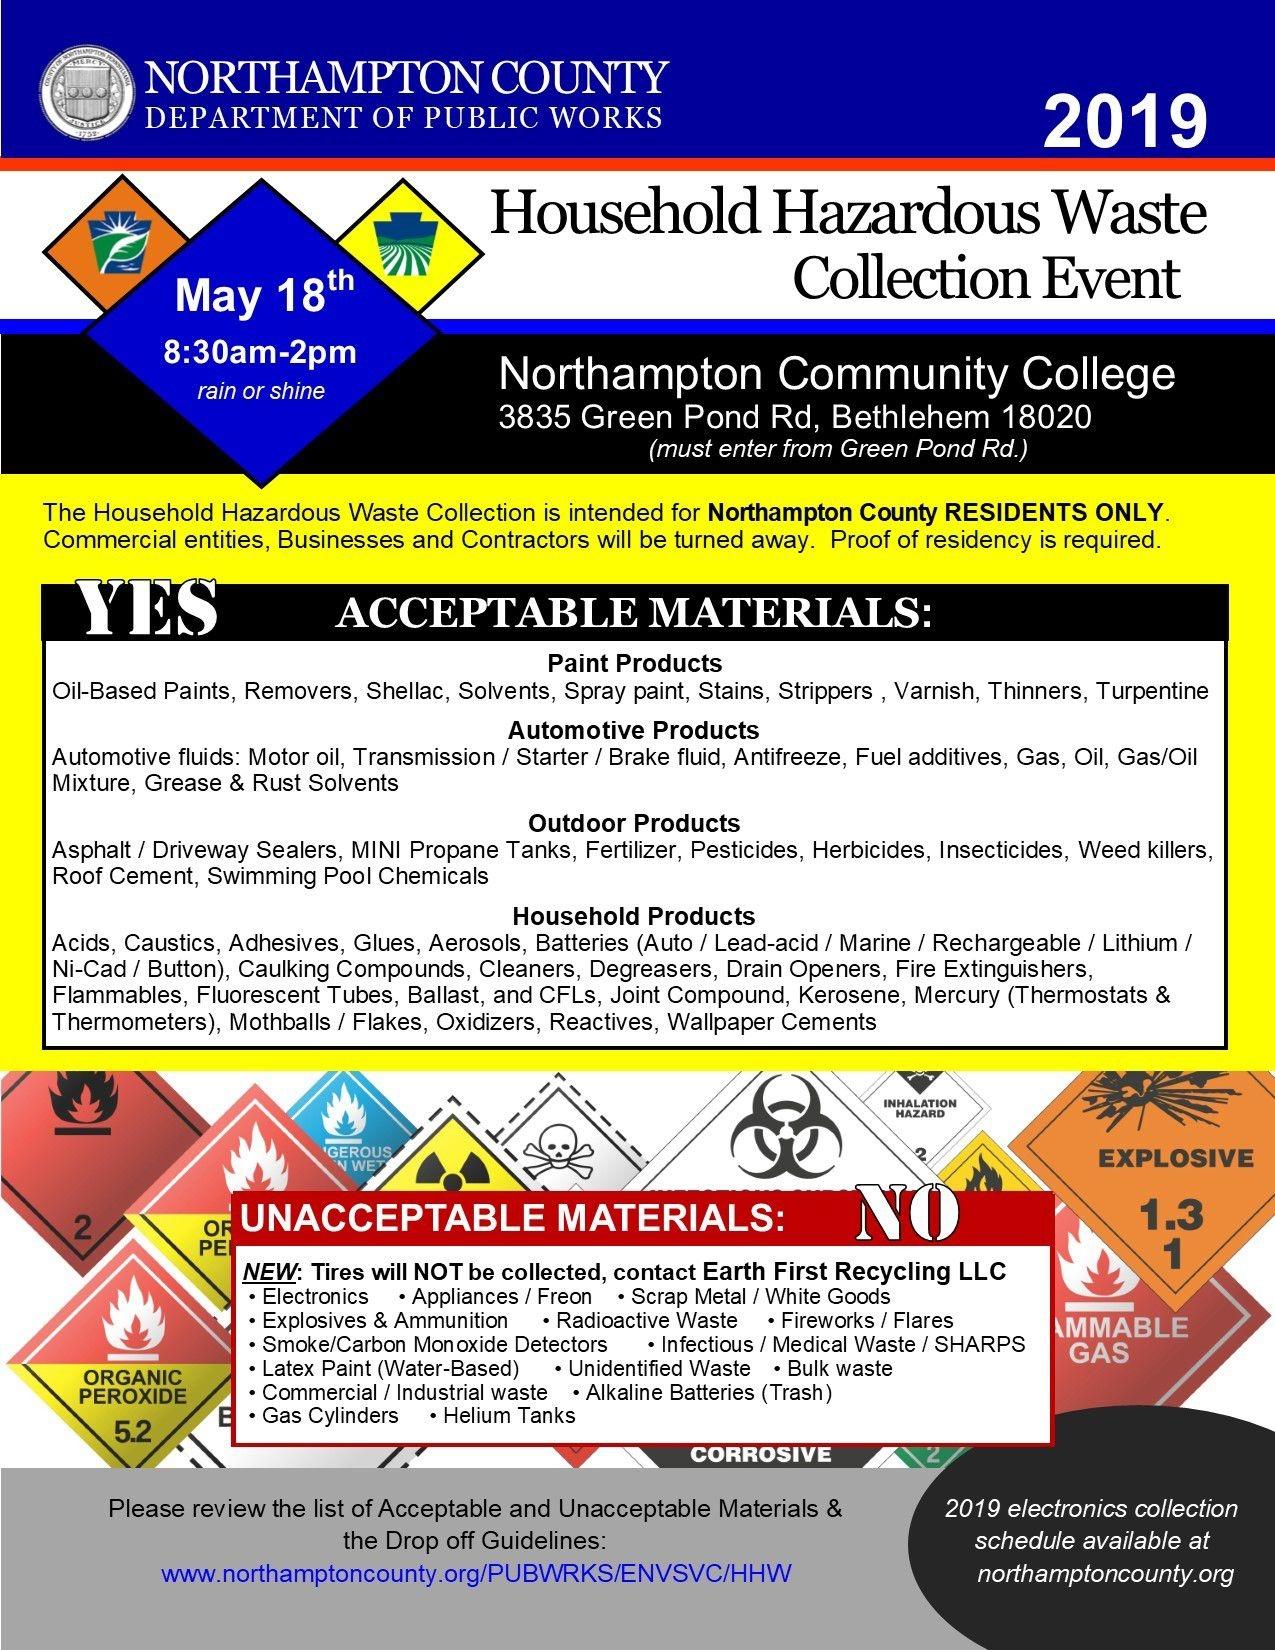 Household Hazardous Waste Collection Event – Northampton